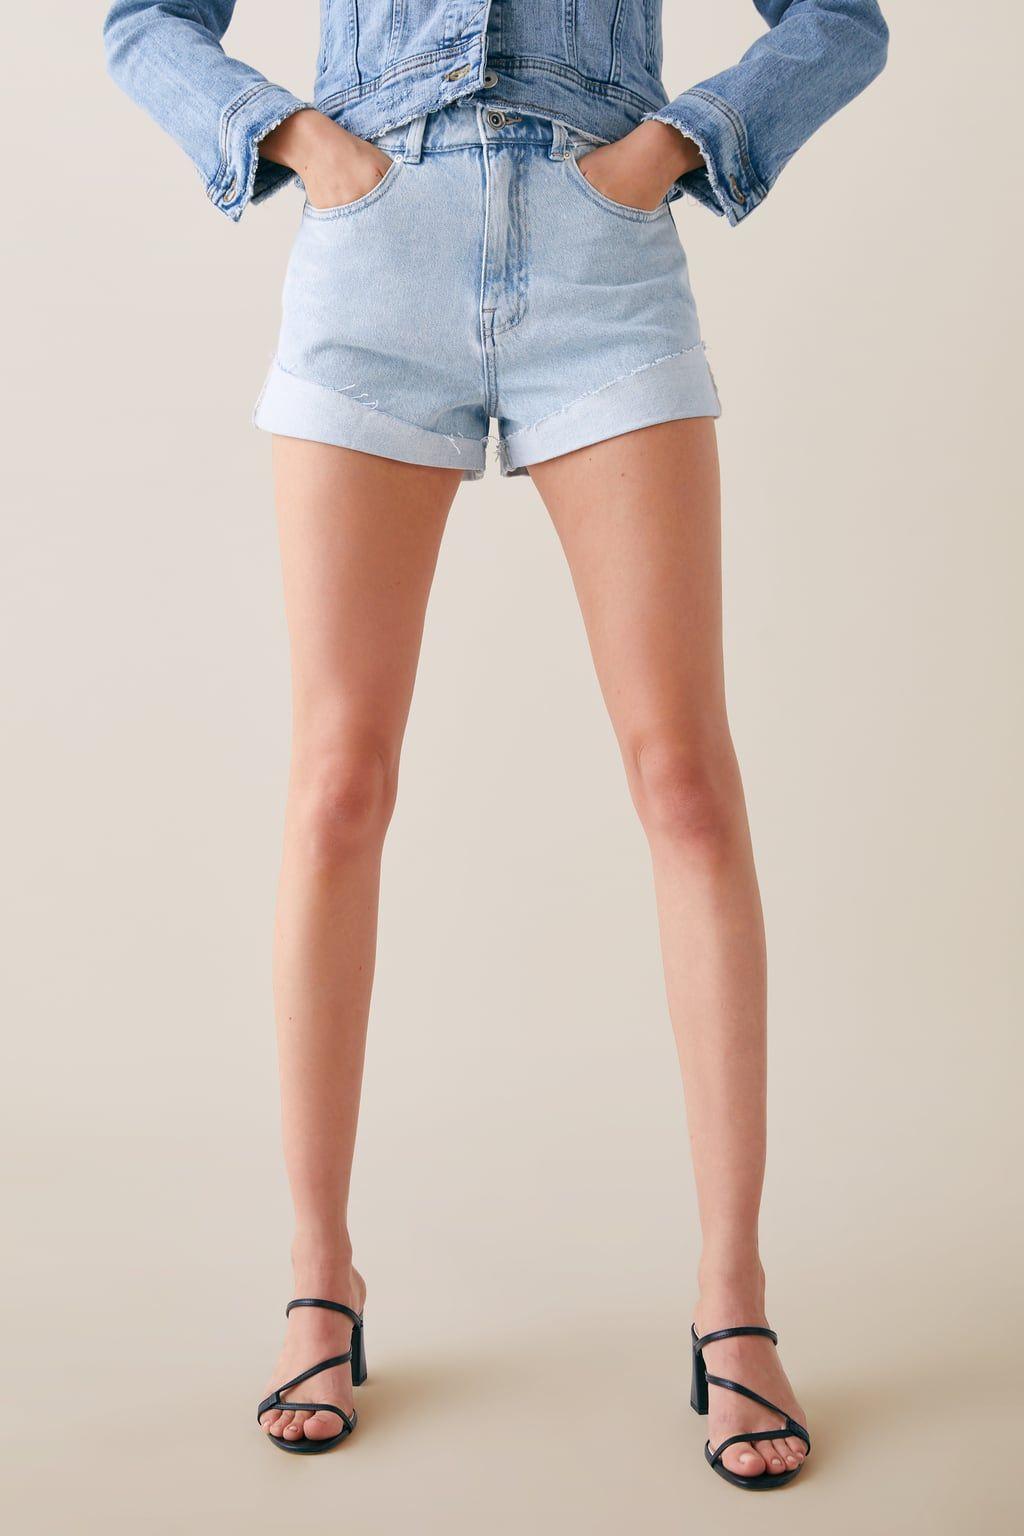 4b3bcad94 Z1975 high waisted shorts in 2019 | Kristen's Wishlist | High ...